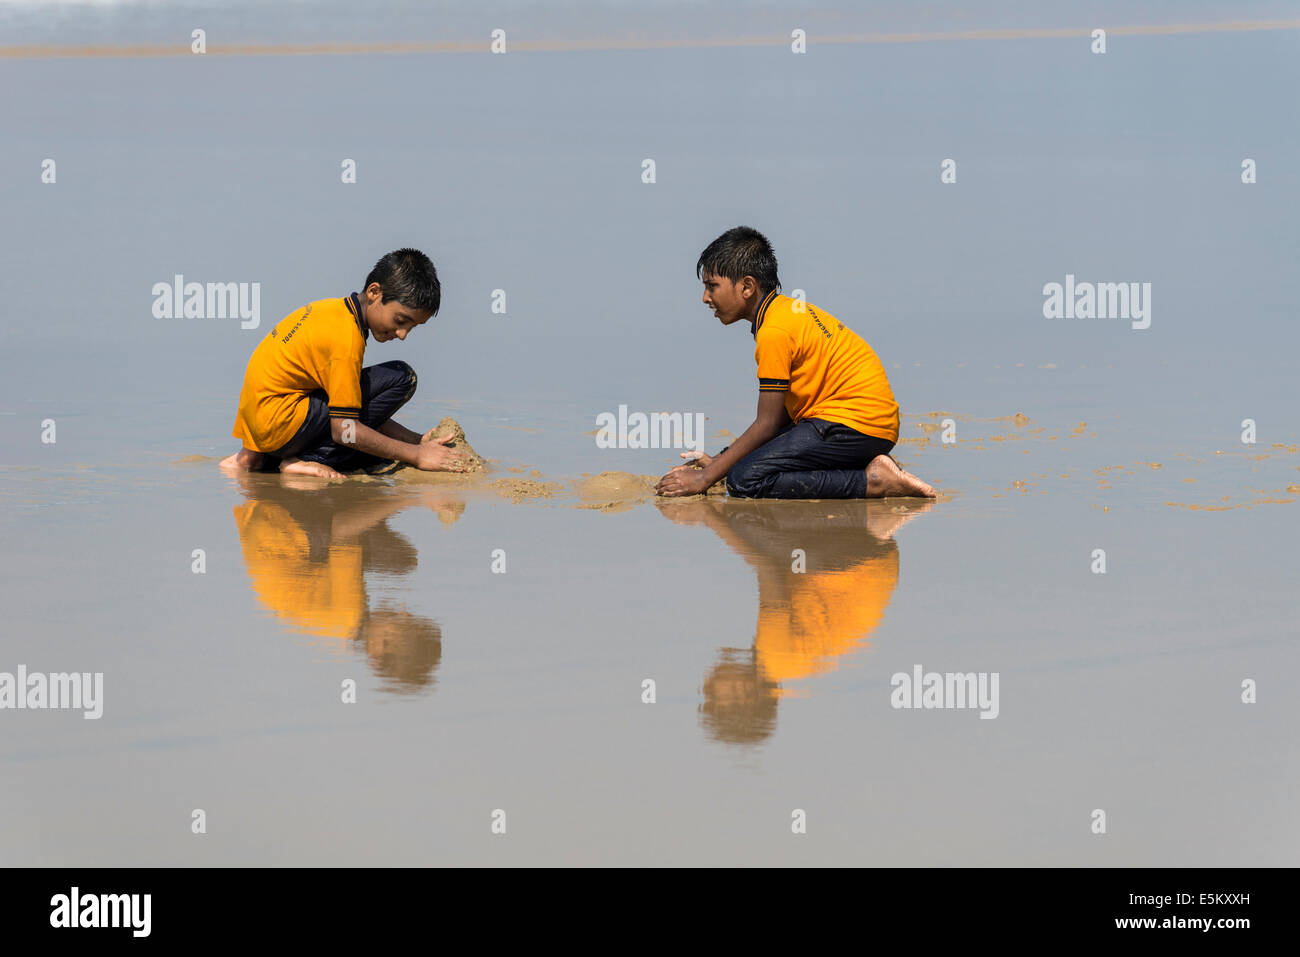 Two schoolboys wearing yellow shirts playing on the beach, reflection, Varkala, Kerala, India Stock Photo